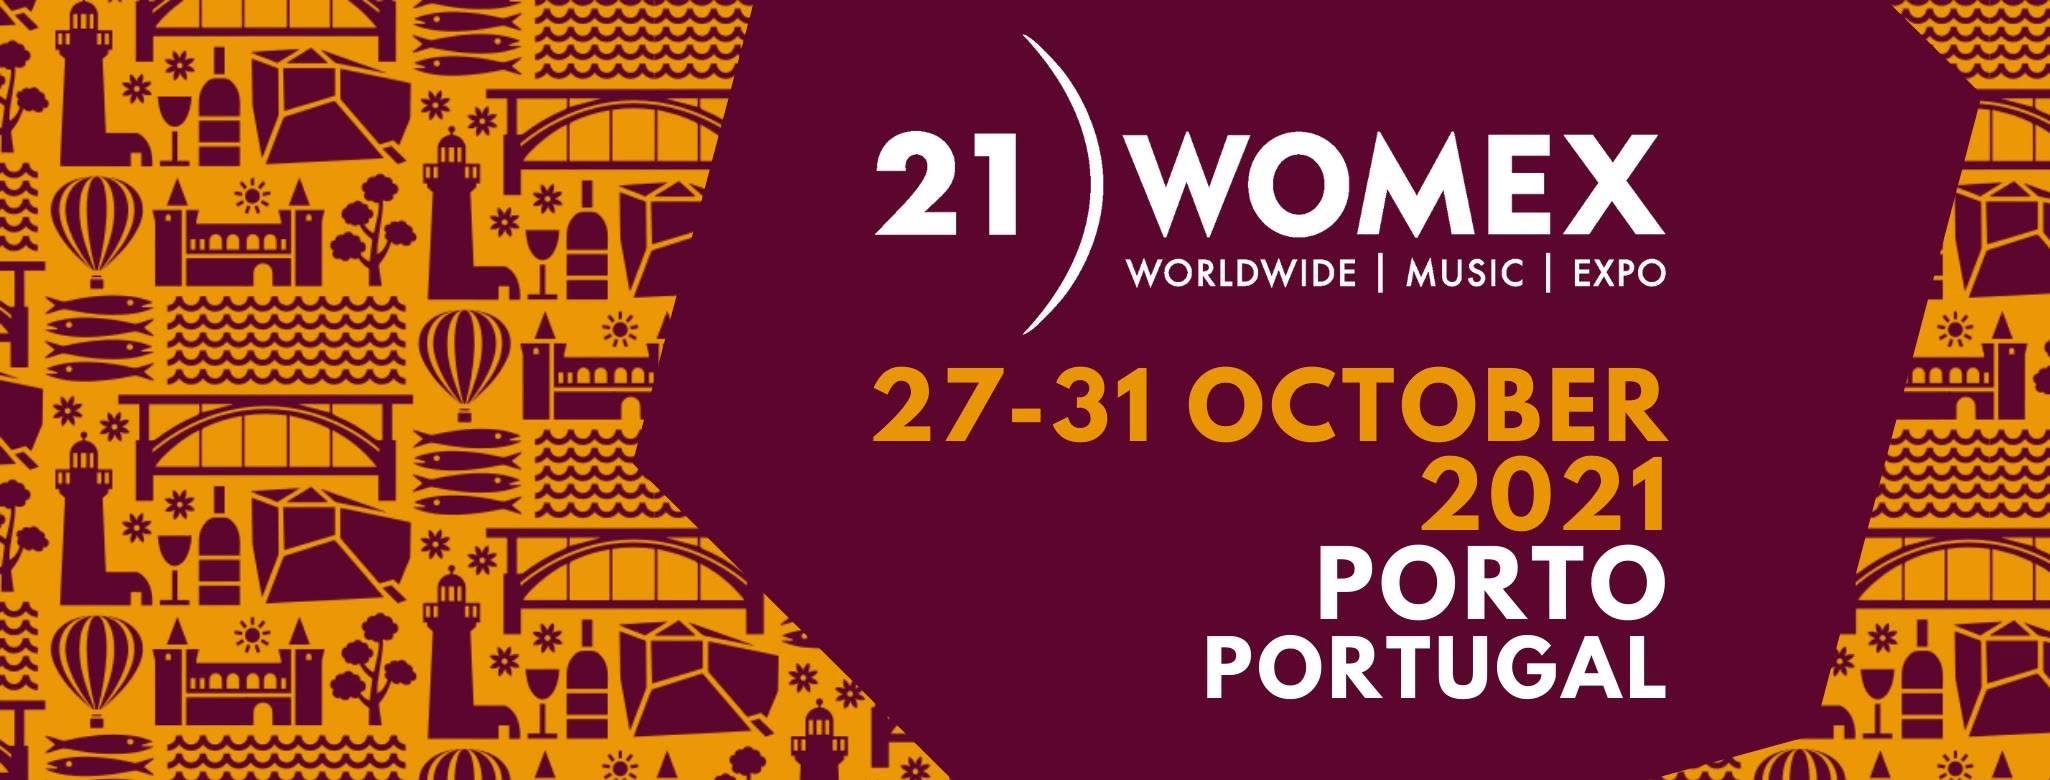 WOMEX 21   Worldwide Music Expo